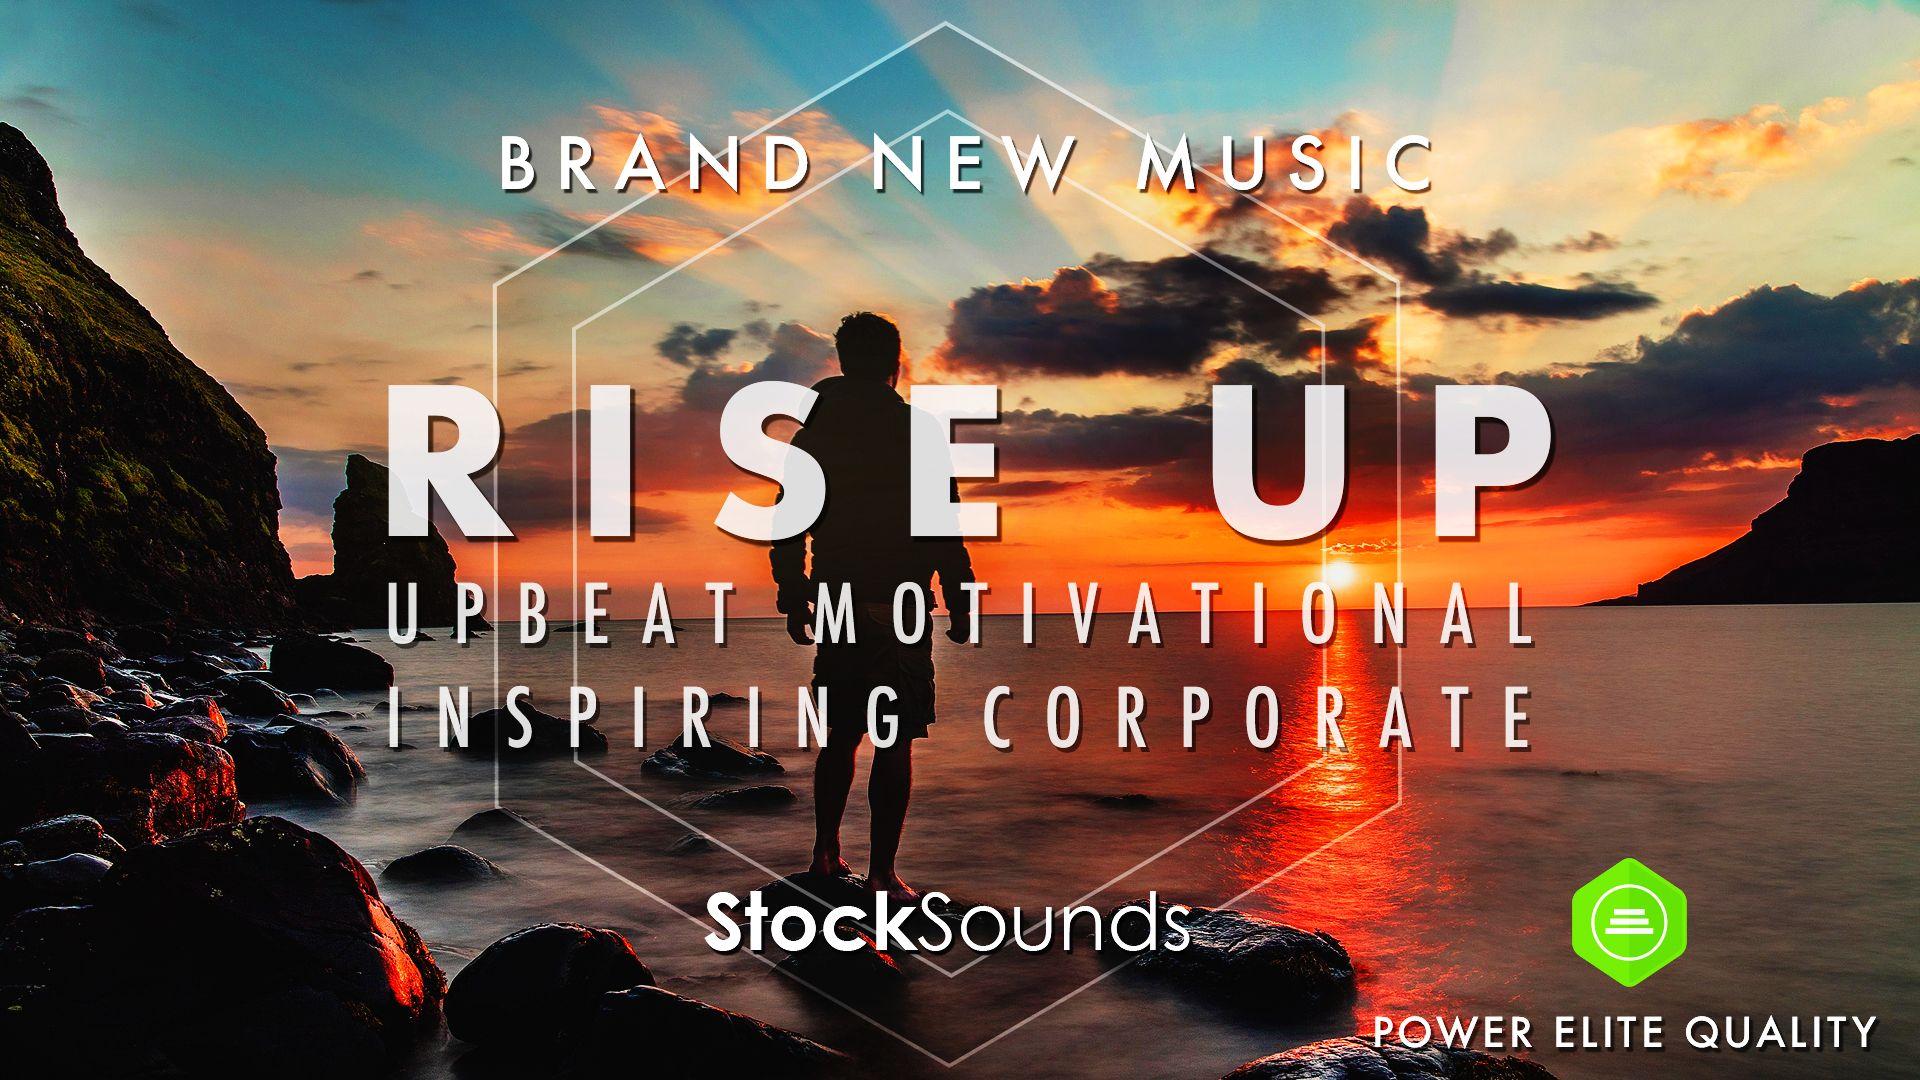 Upbeat Corporate Motivational Inspiring Uplifting - 1